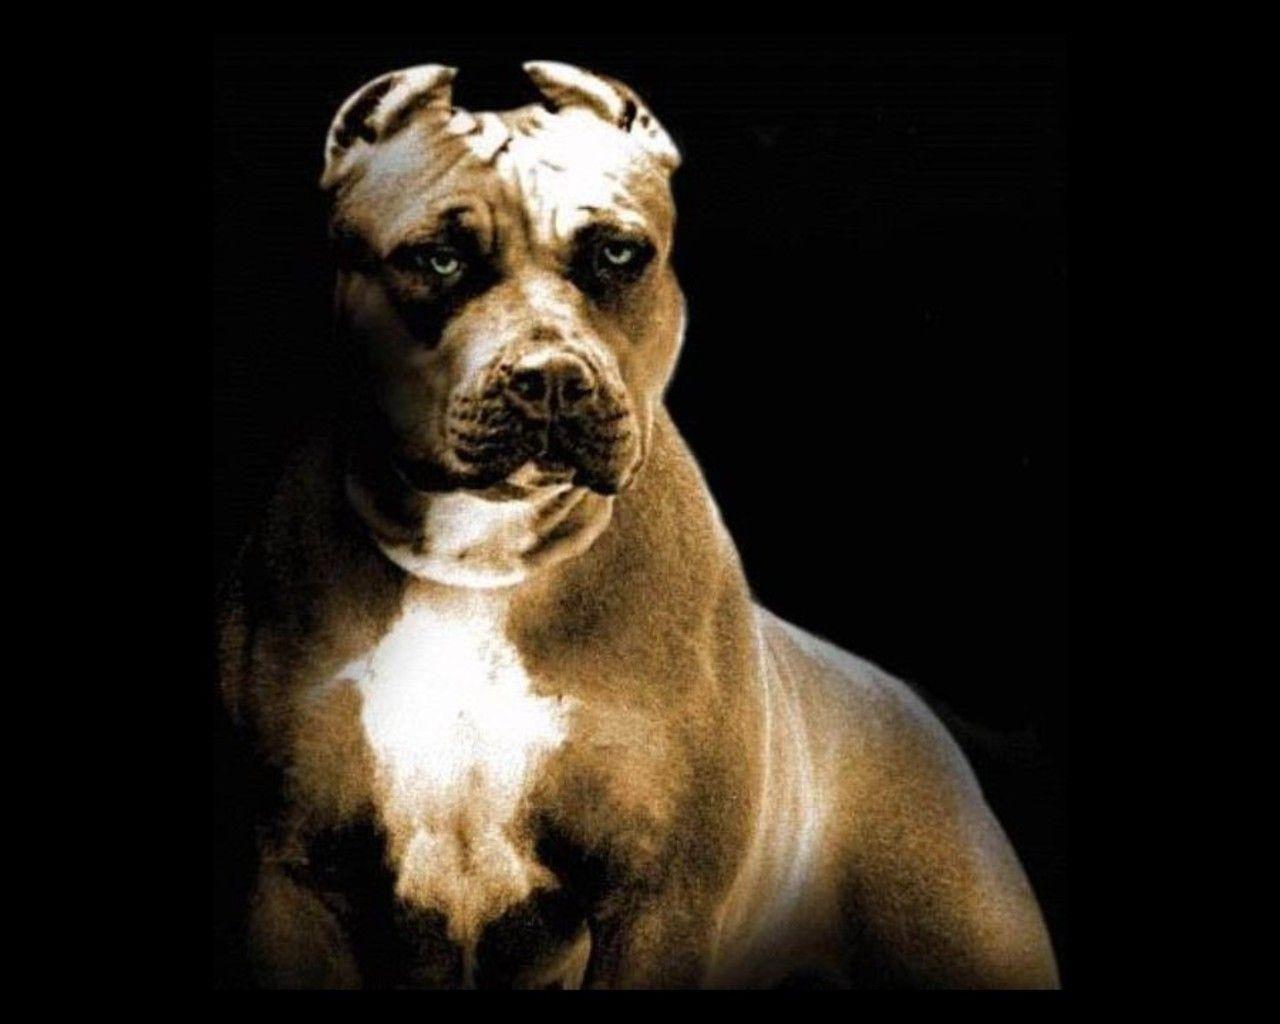 Pitbull Dog New Wallpapers Pitbull Dog Pictures Free Download Pitbulls Pitbull Dog Pitbull Terrier